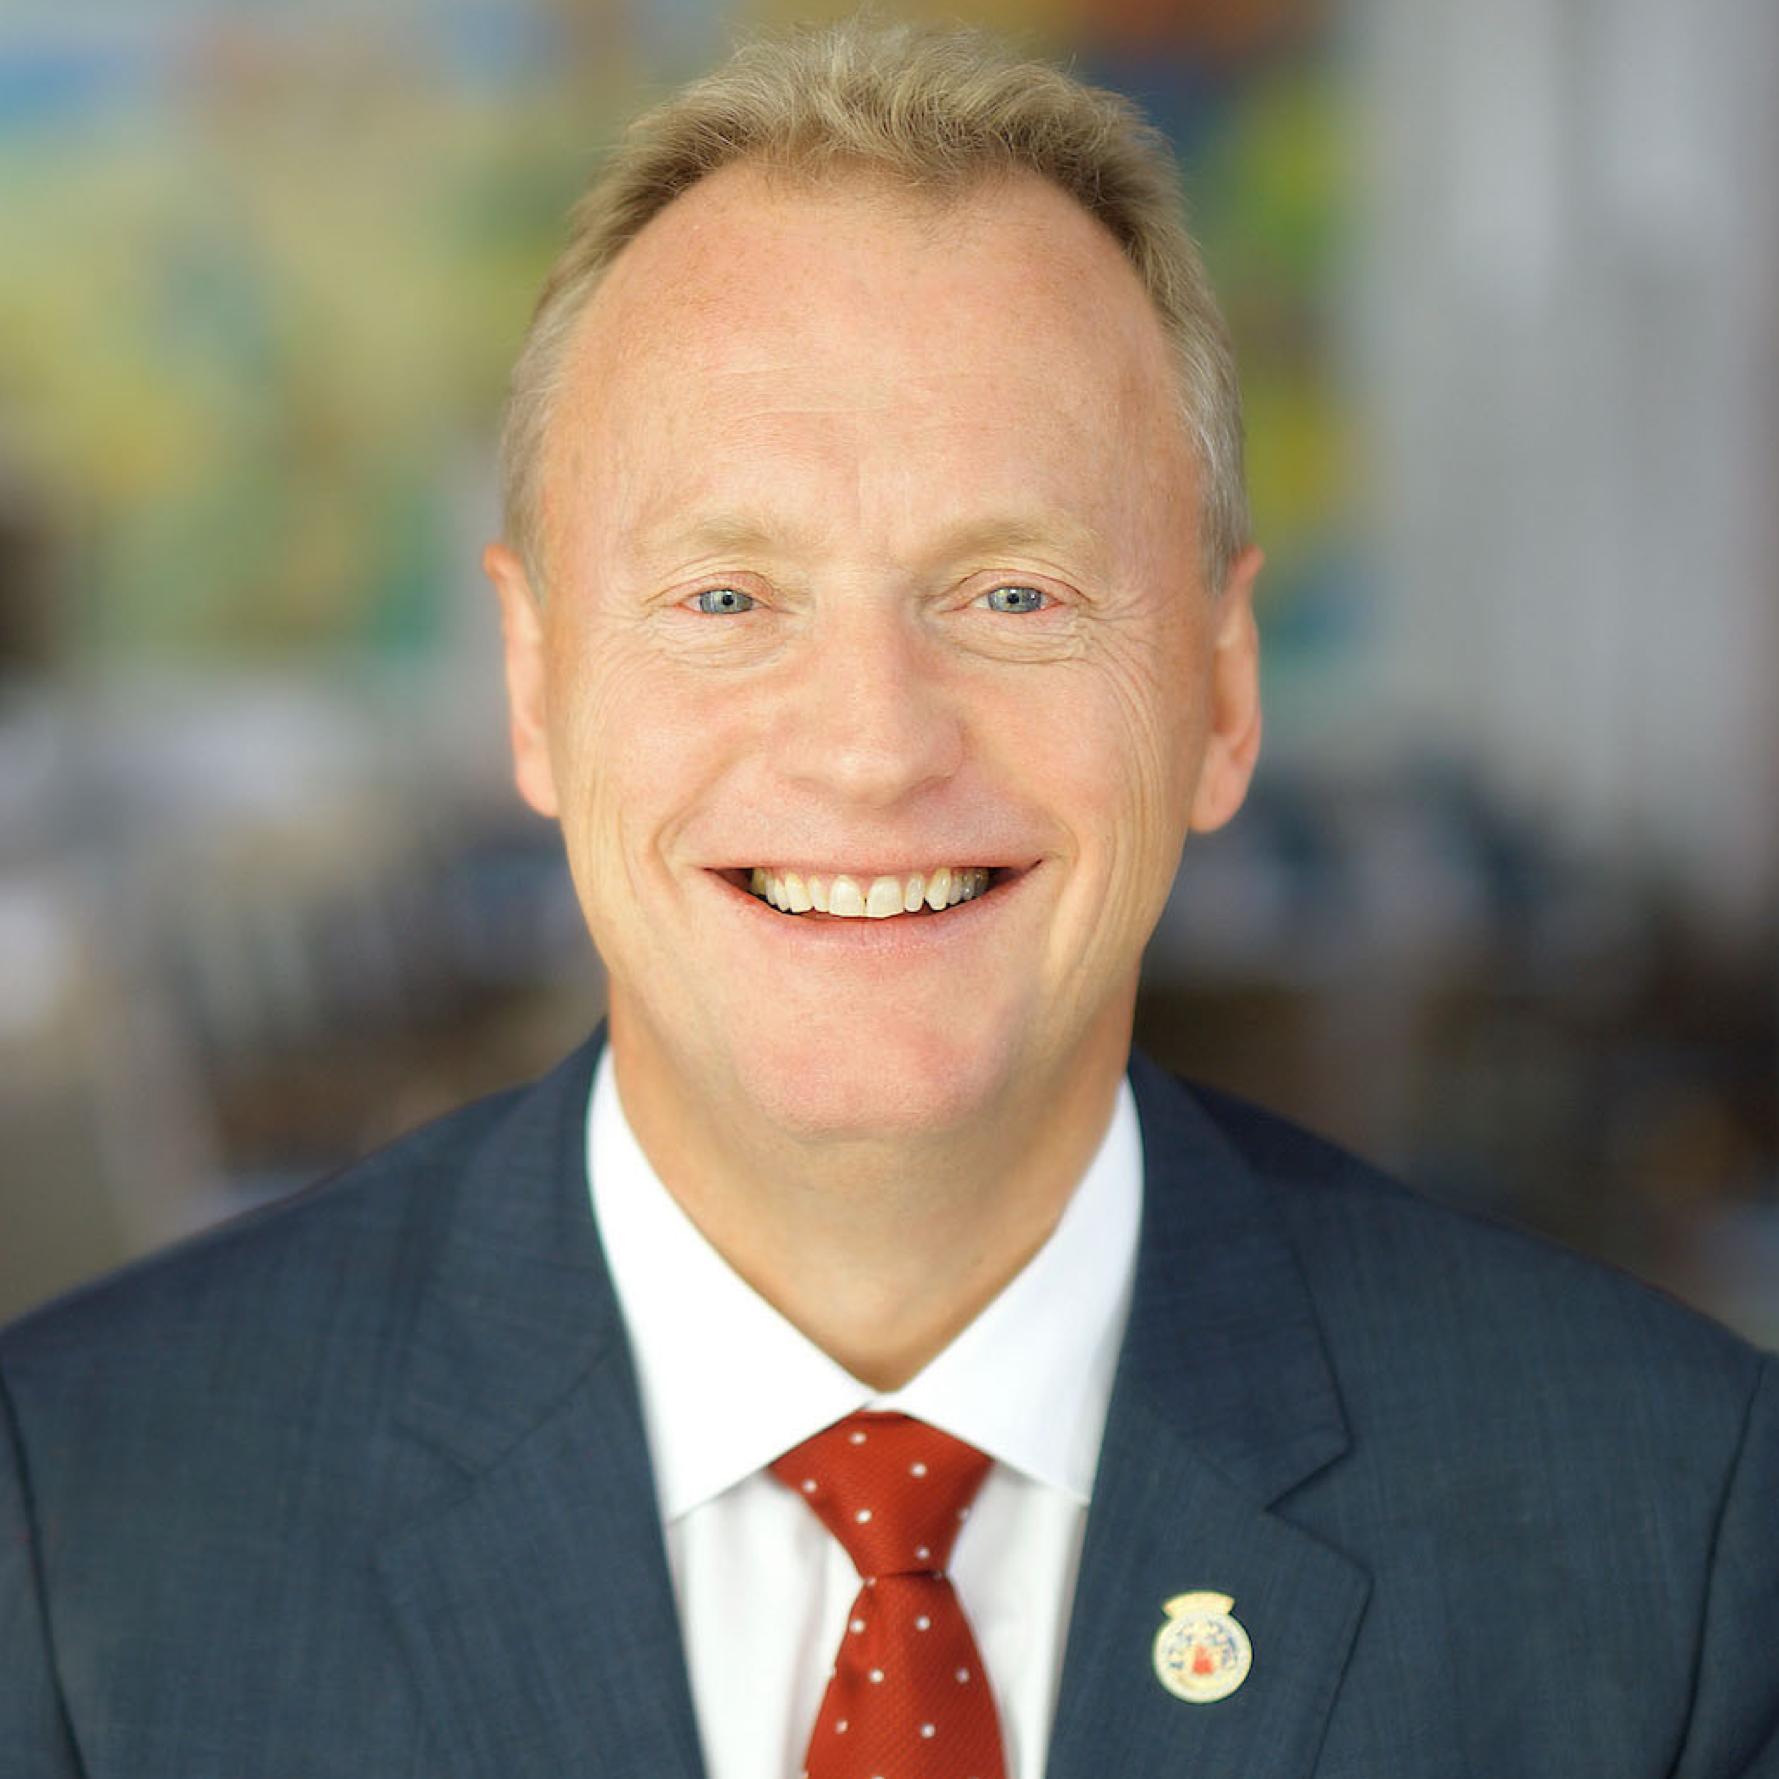 Raymond Johansen   The Governing Mayor leading Oslo through its green transition